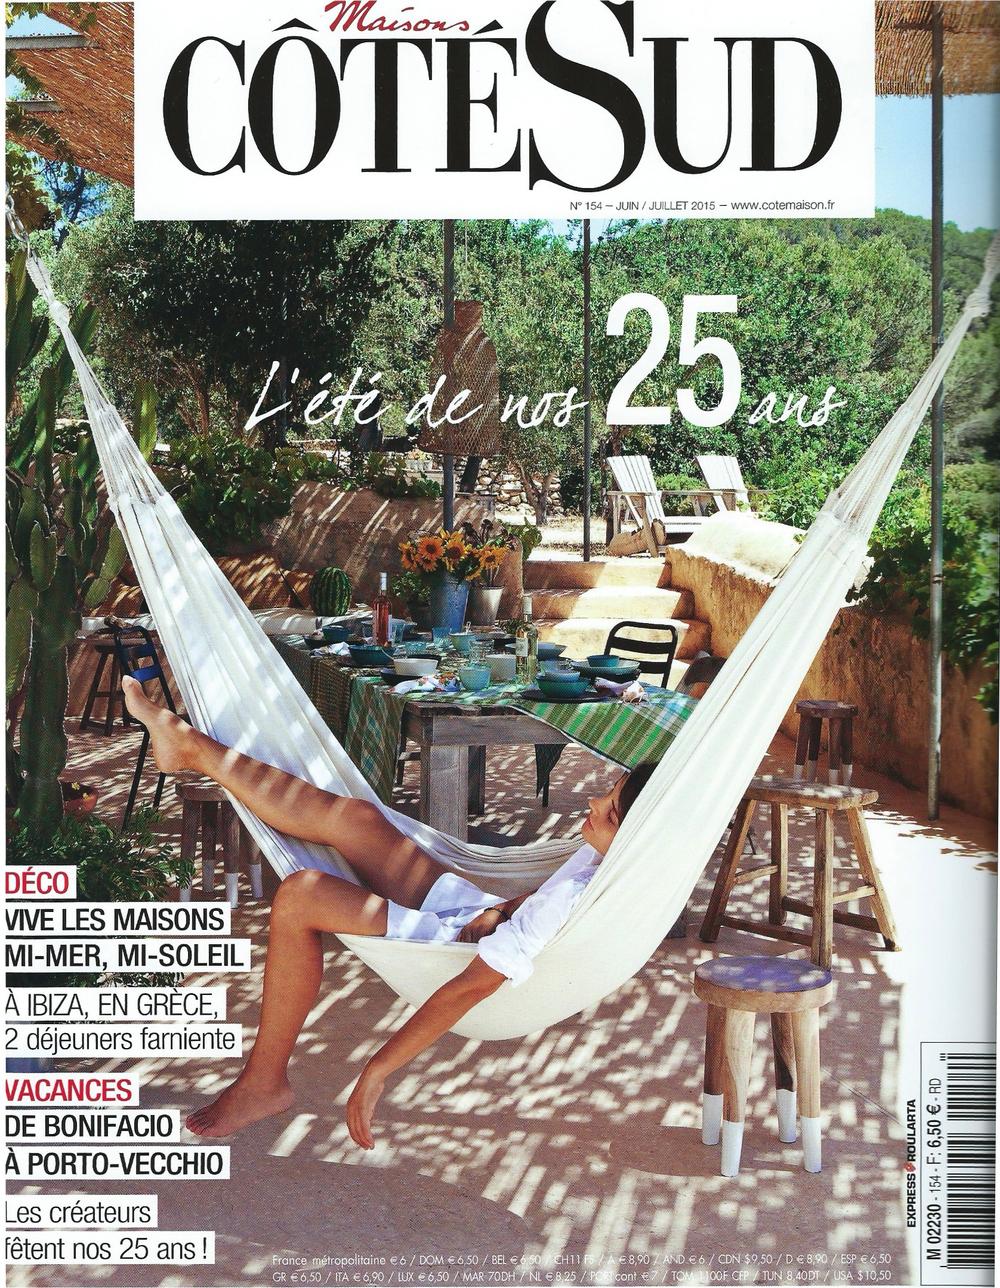 COTESUD_Magazine_COUV_JUIN15.jpg